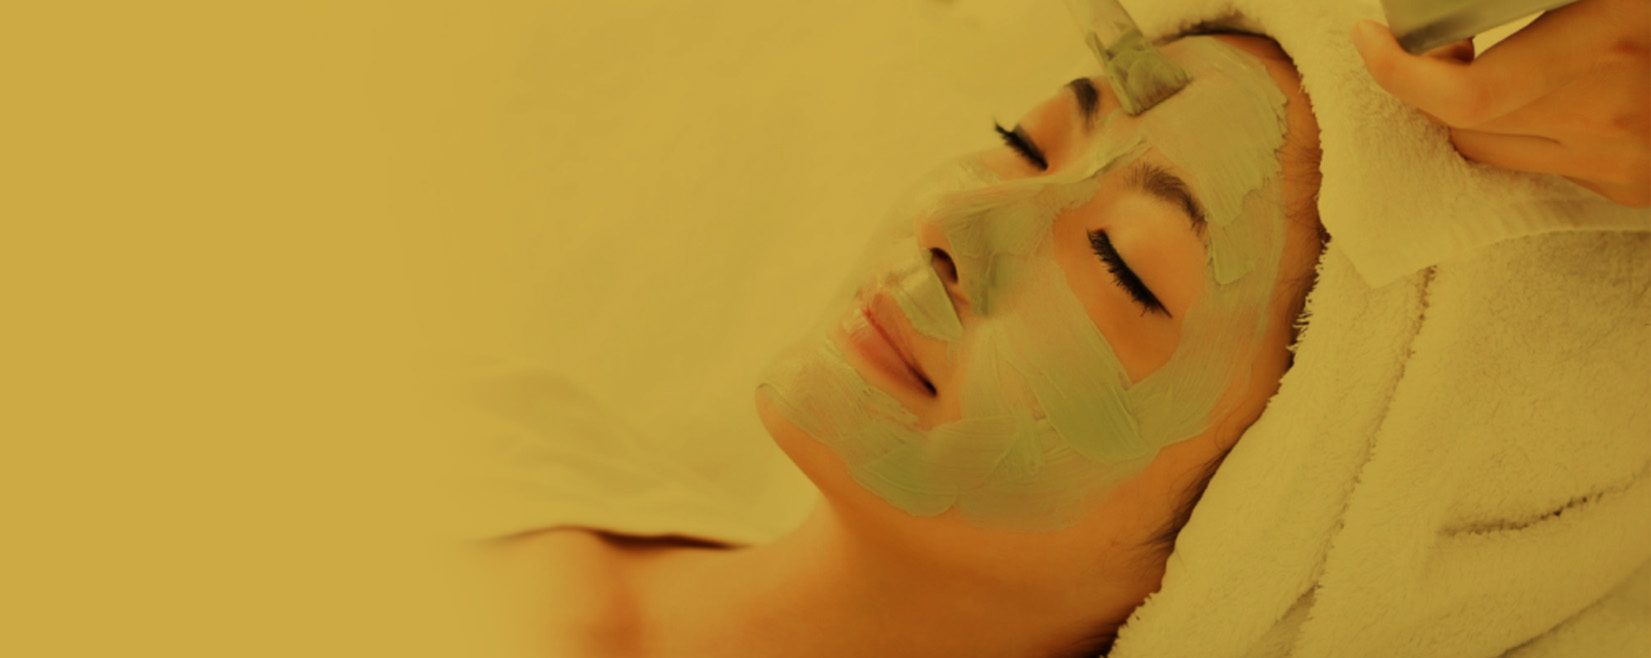 alissi bronte dermatologia organica tratamiento cc - Alissi Brontë | Alta cosmética natural de calidad europea | Guadalajara